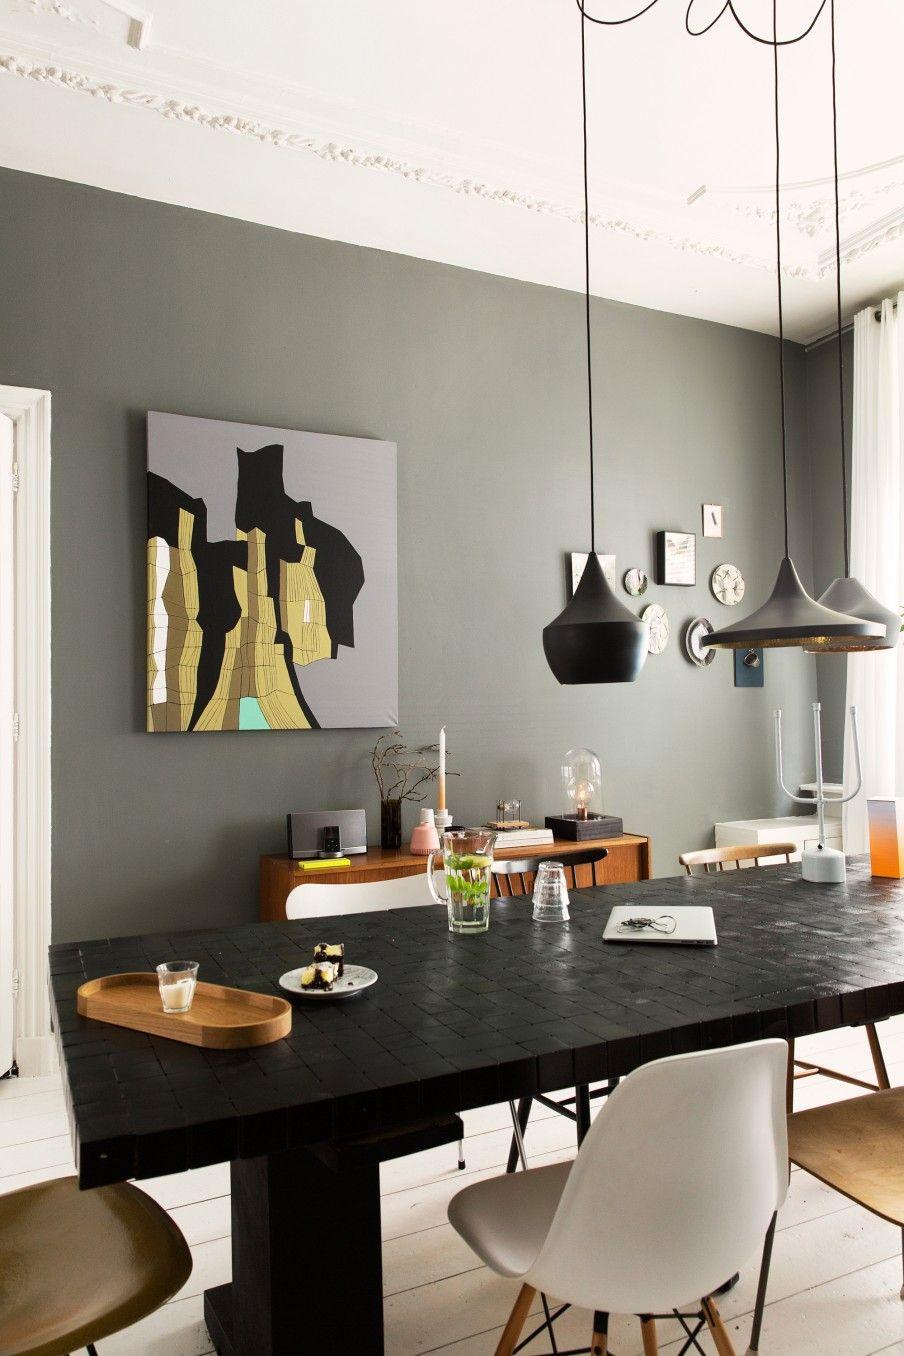 mur kaki a la haye d co inspirations pinterest. Black Bedroom Furniture Sets. Home Design Ideas